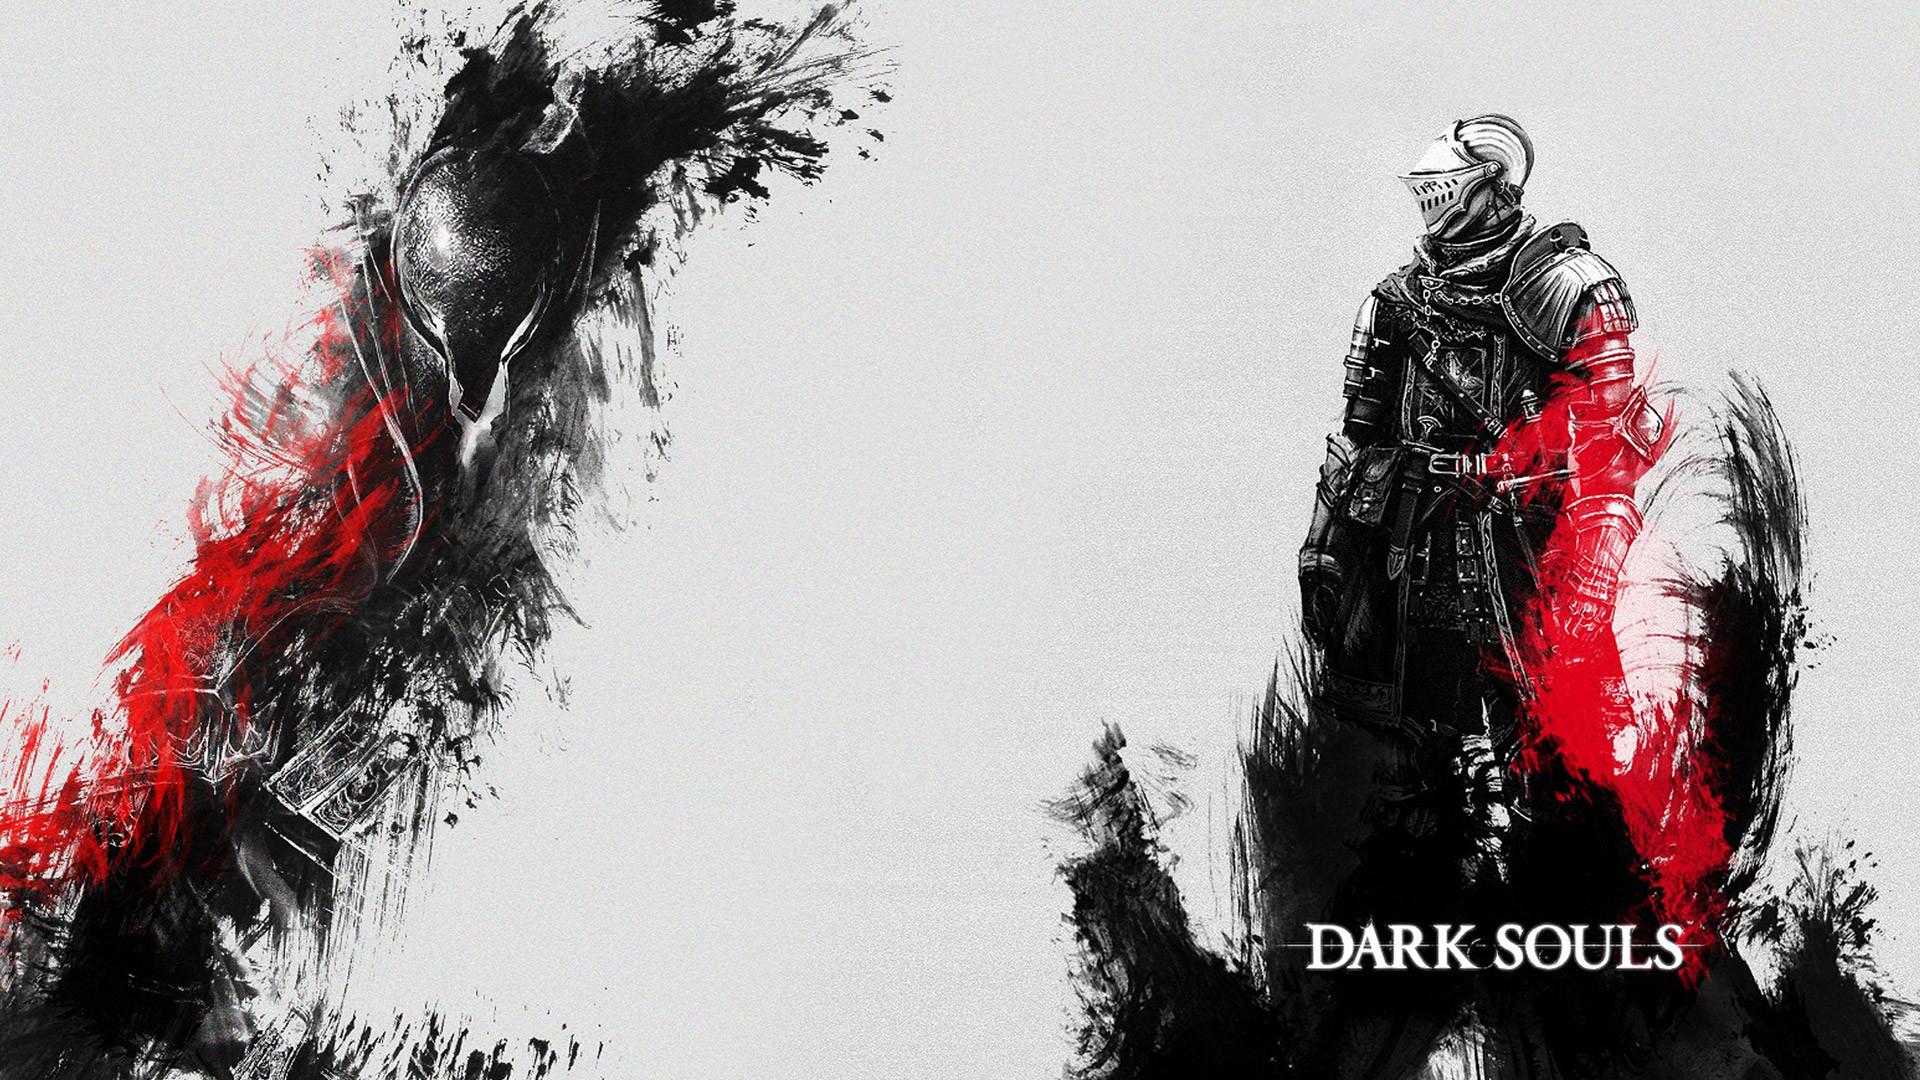 Dark Souls Red and Black Wallpaper